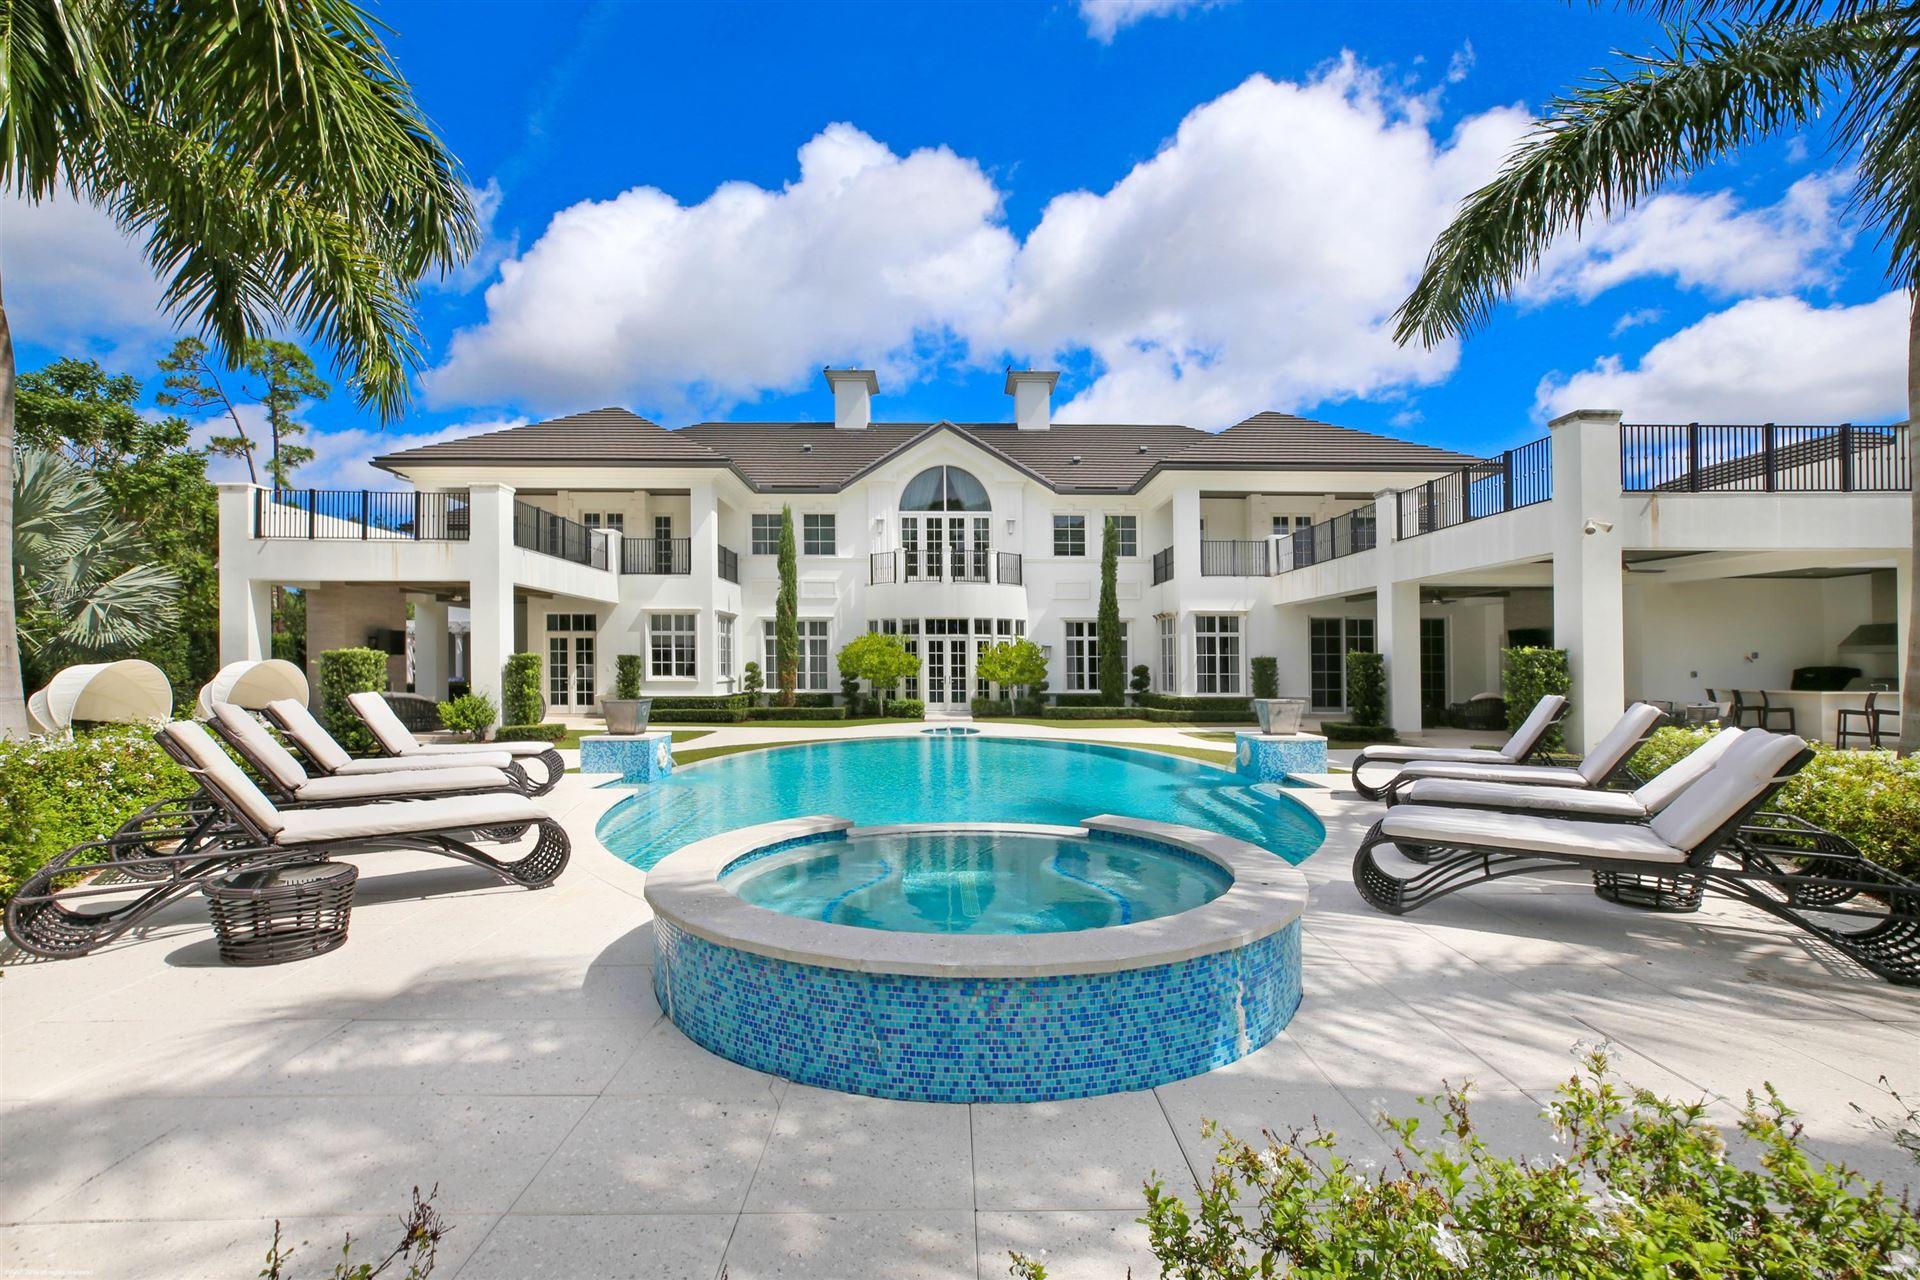 Photo of 12403 Hautree Court, Palm Beach Gardens, FL 33418 (MLS # RX-10664494)